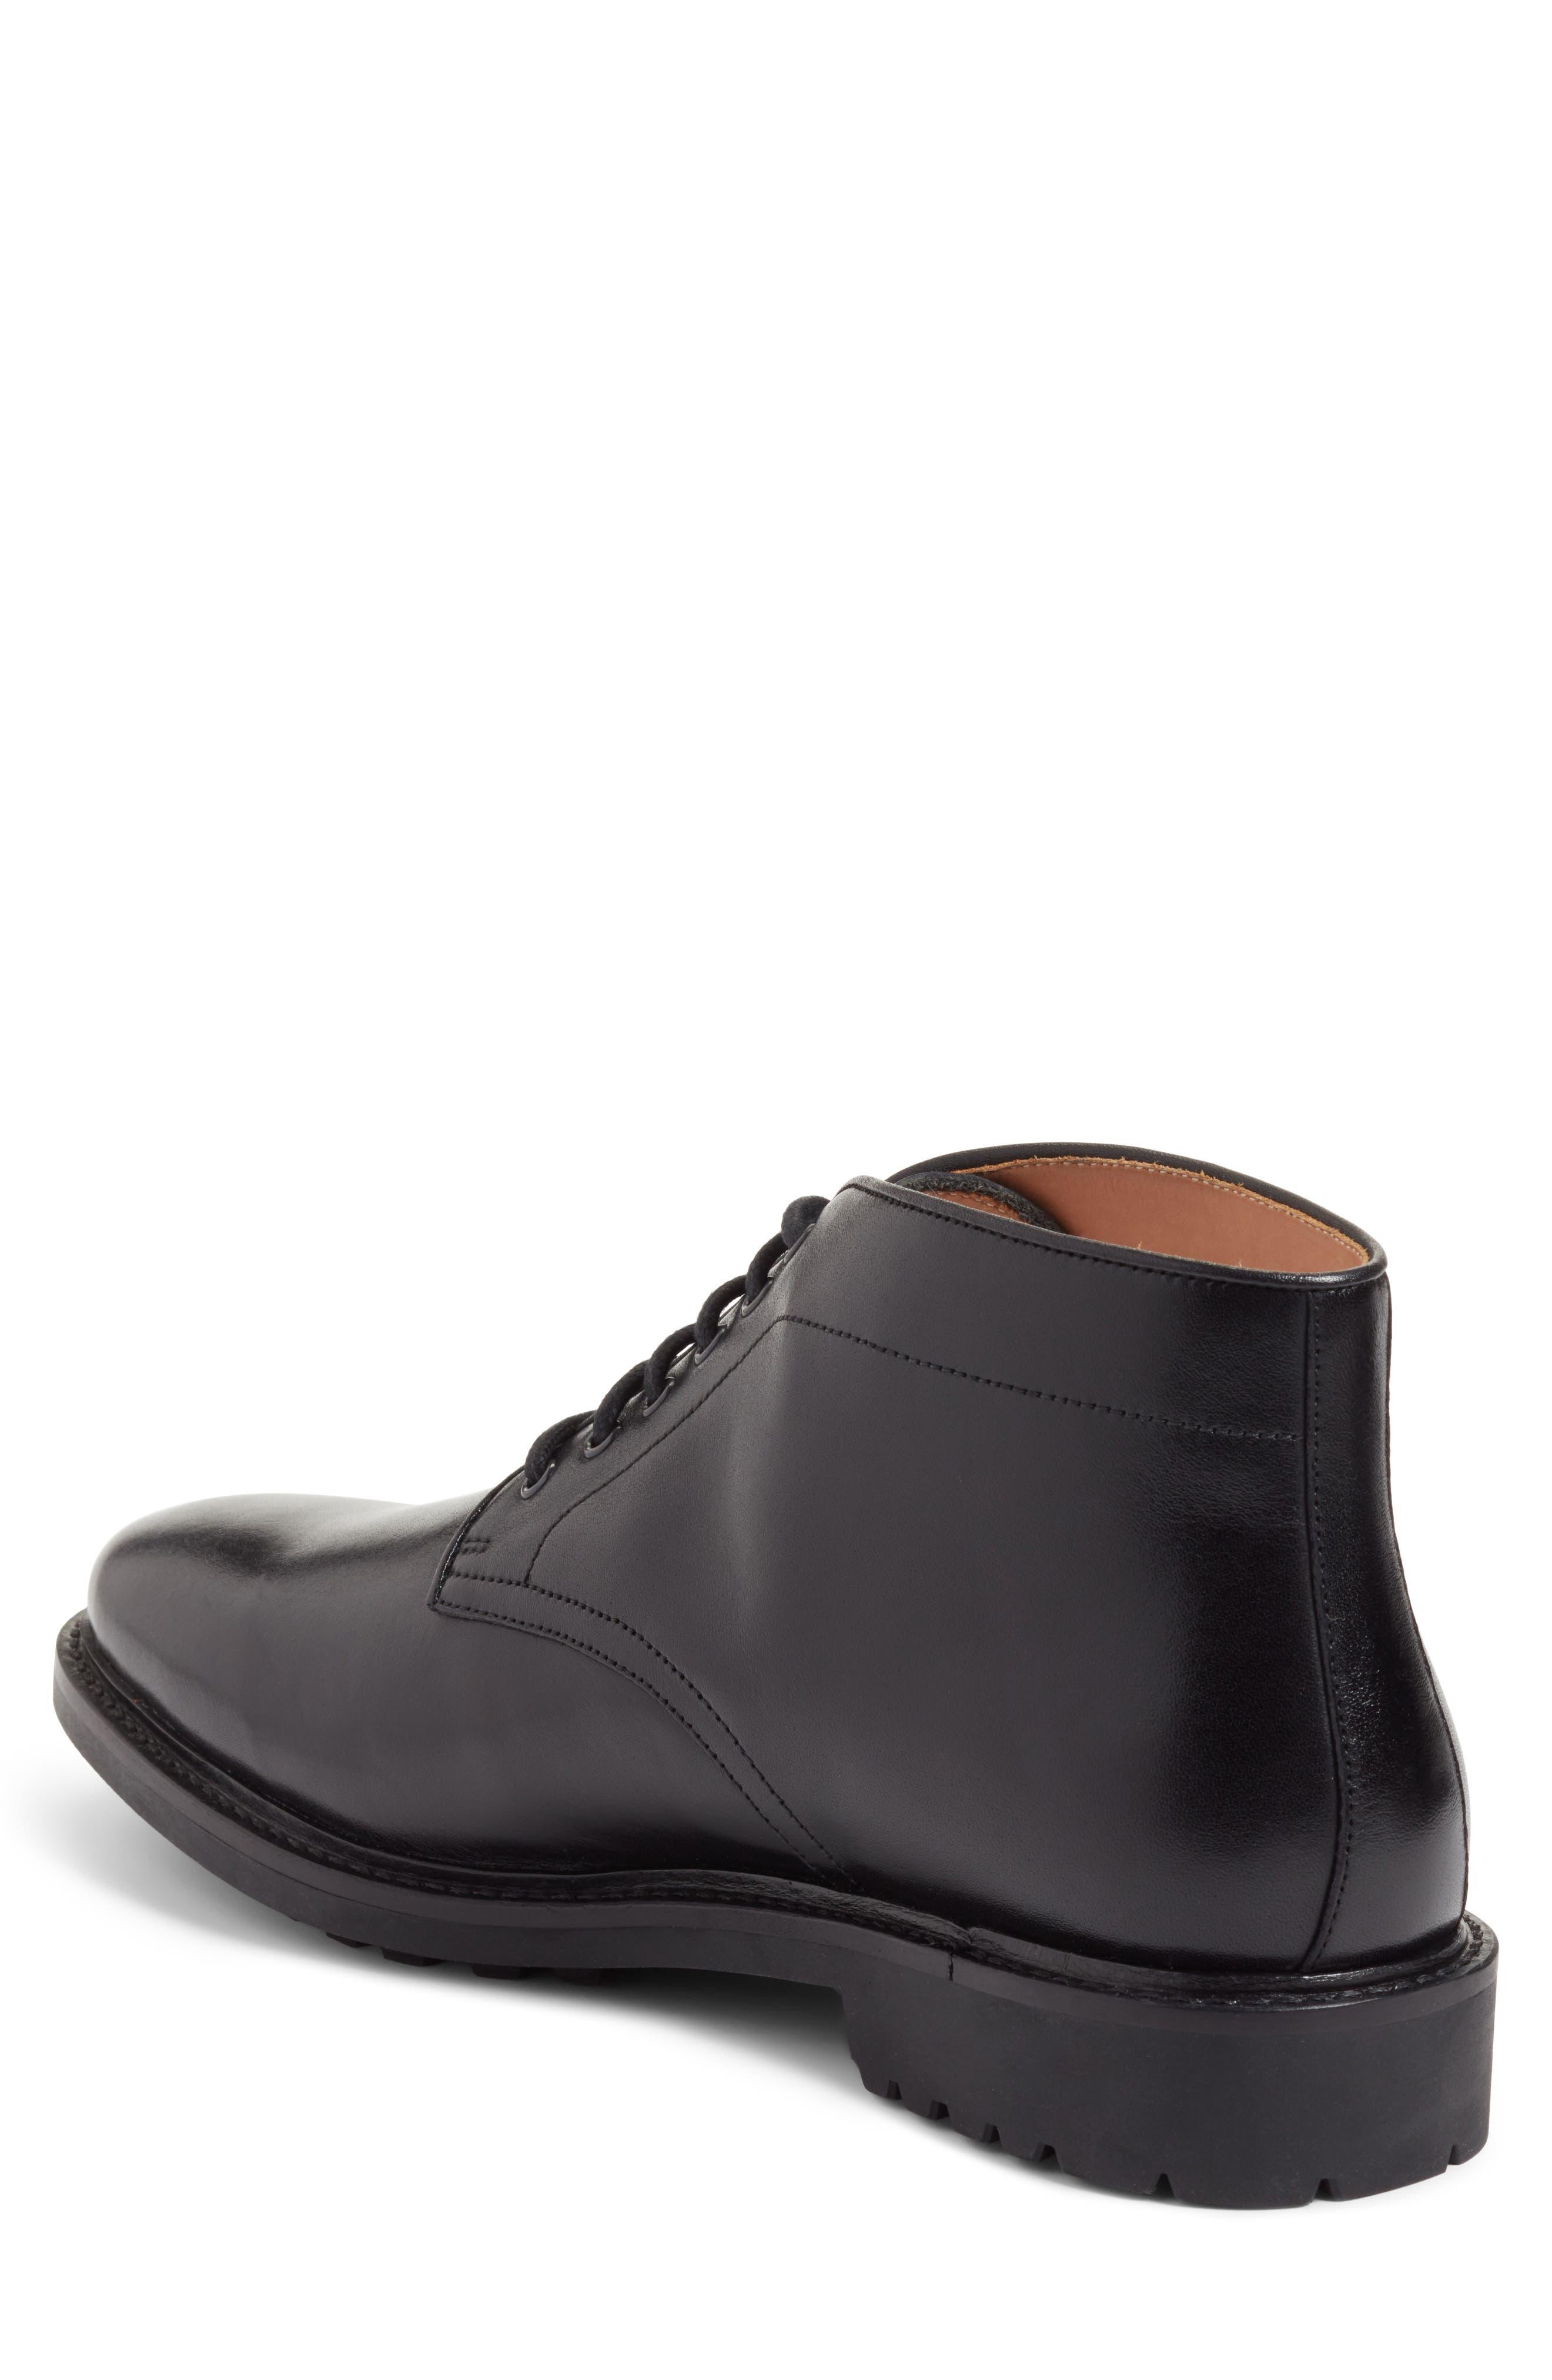 Alternate Image 2  - John W. Nordstrom® Ramiro Plain Toe Boot (Men)